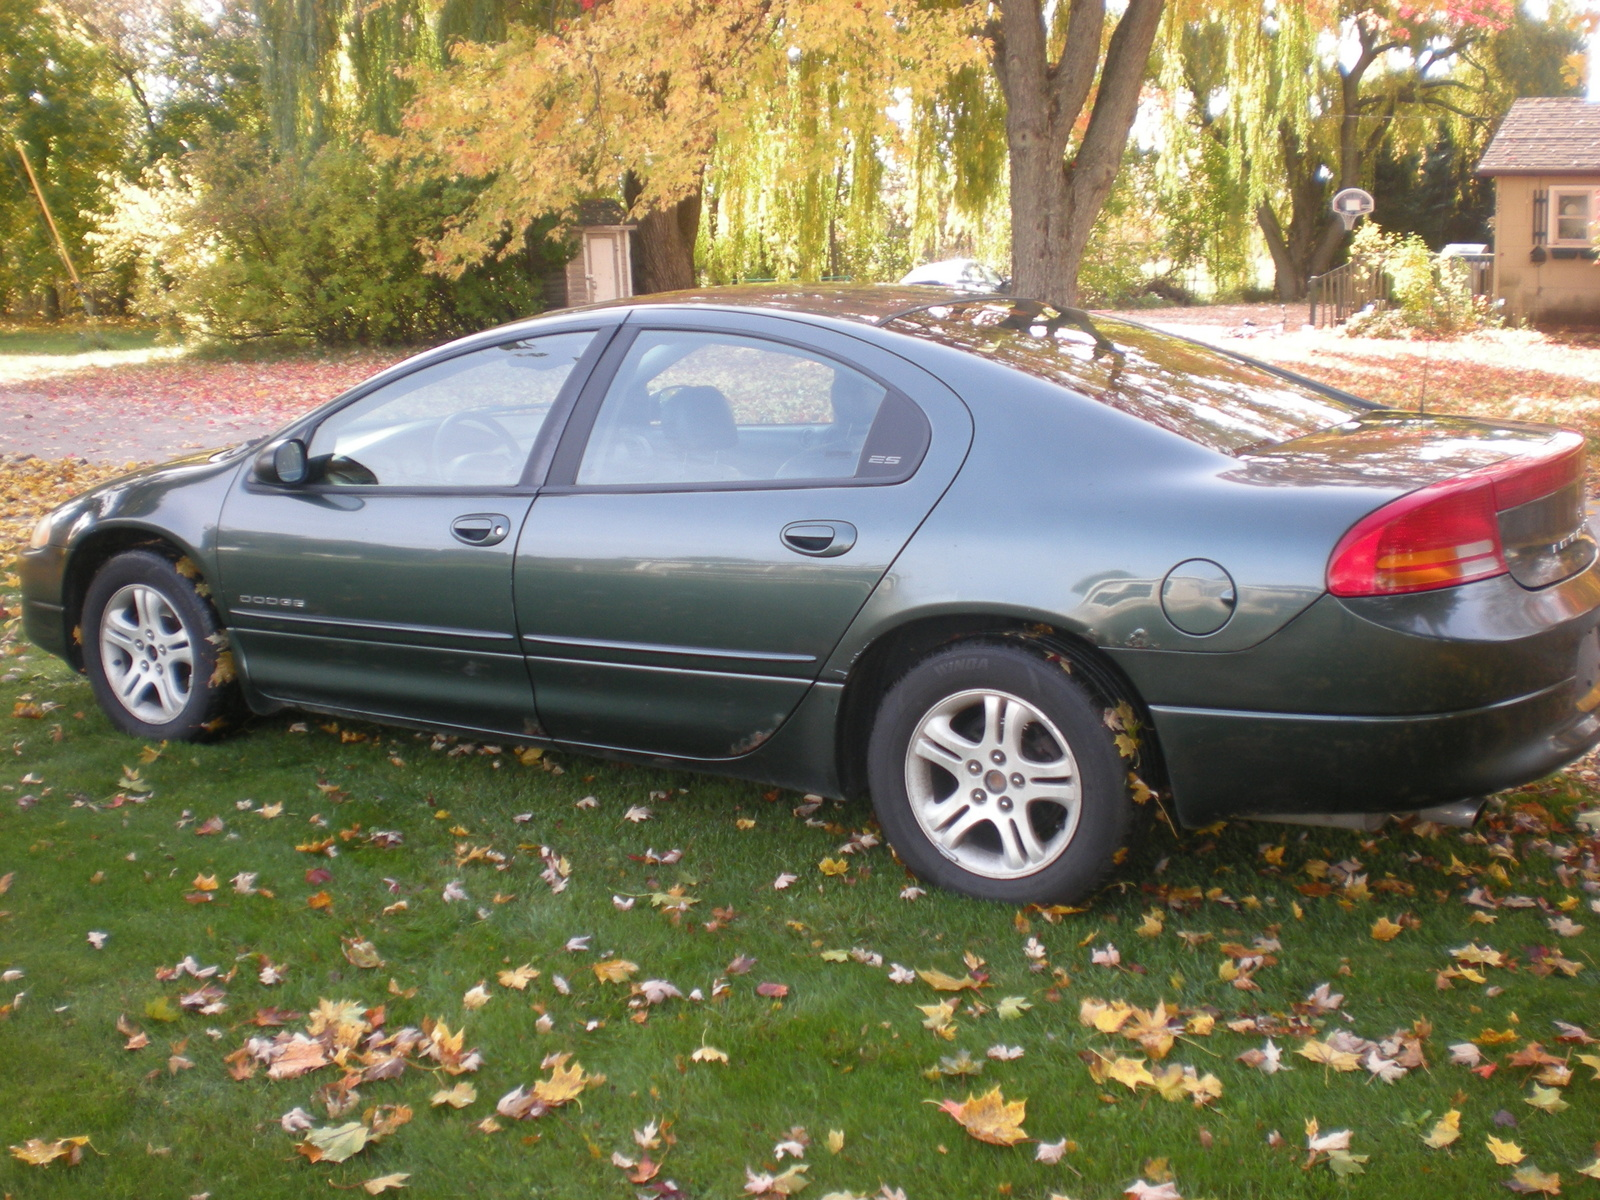 2000 Dodge Intrepid - Overview